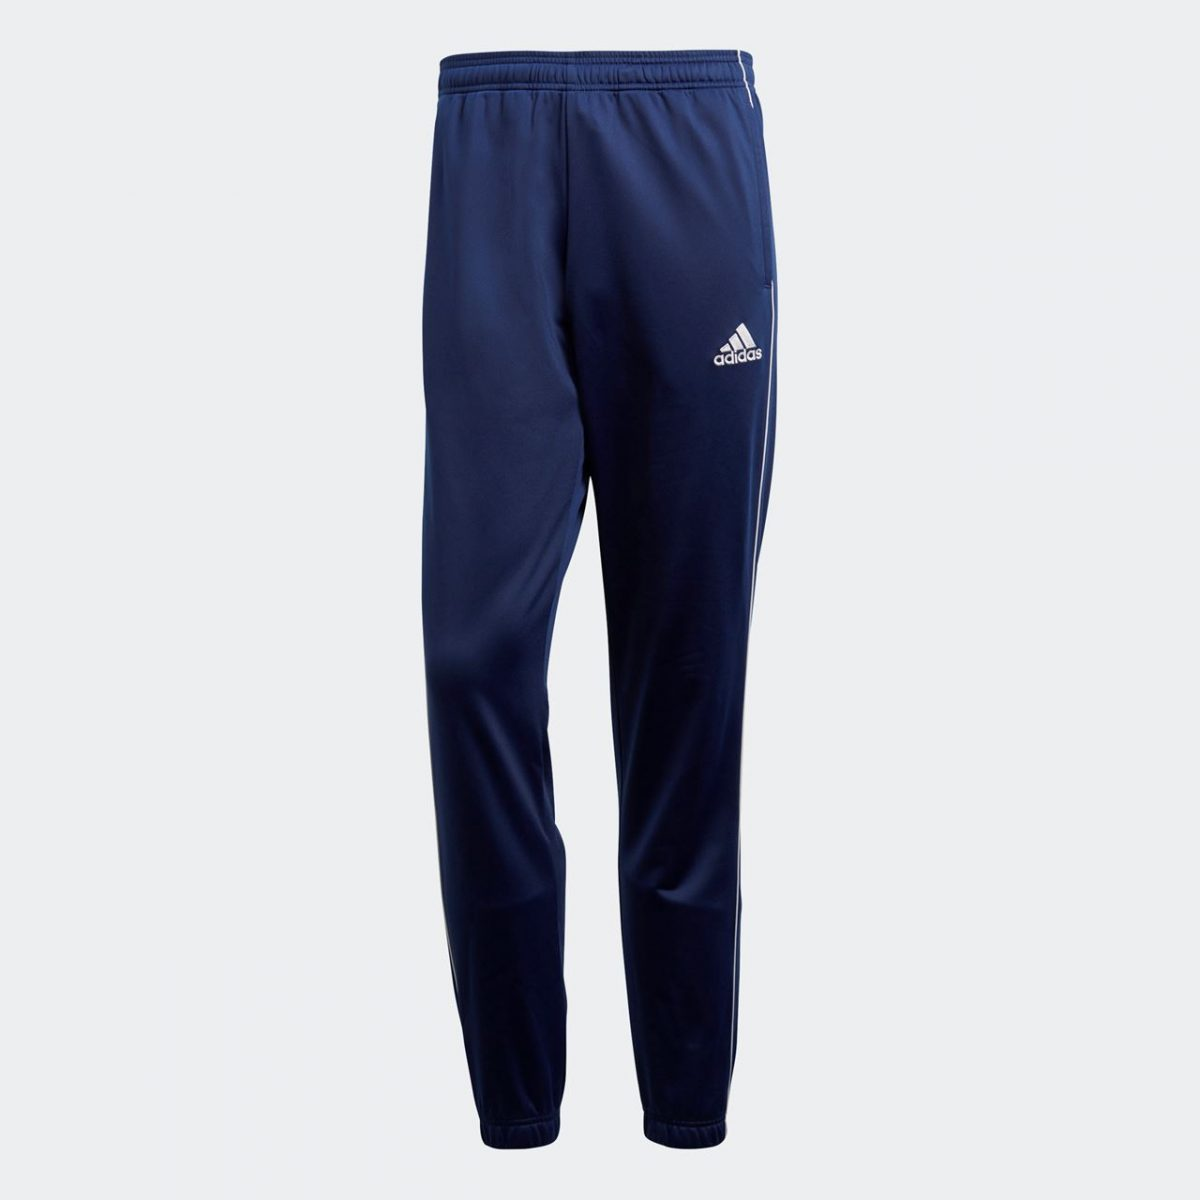 Adidas Core 18 PES Pant Adult